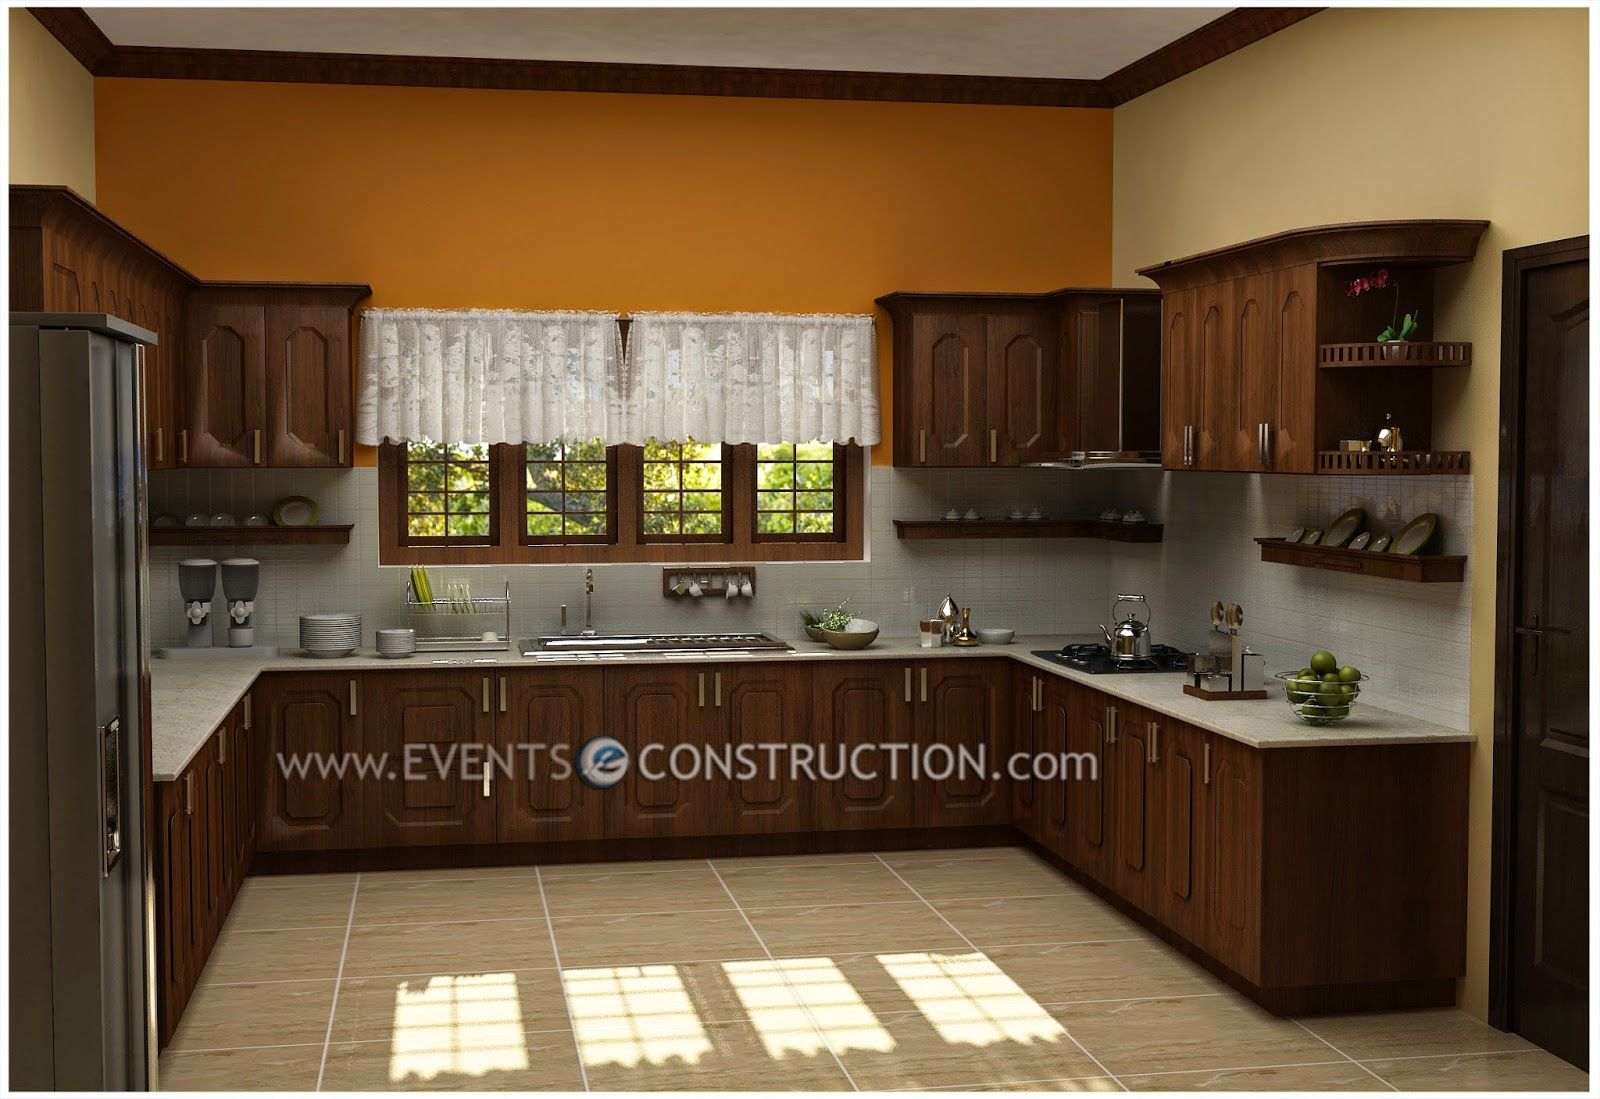 kitchen design ideas kerala style Interior design